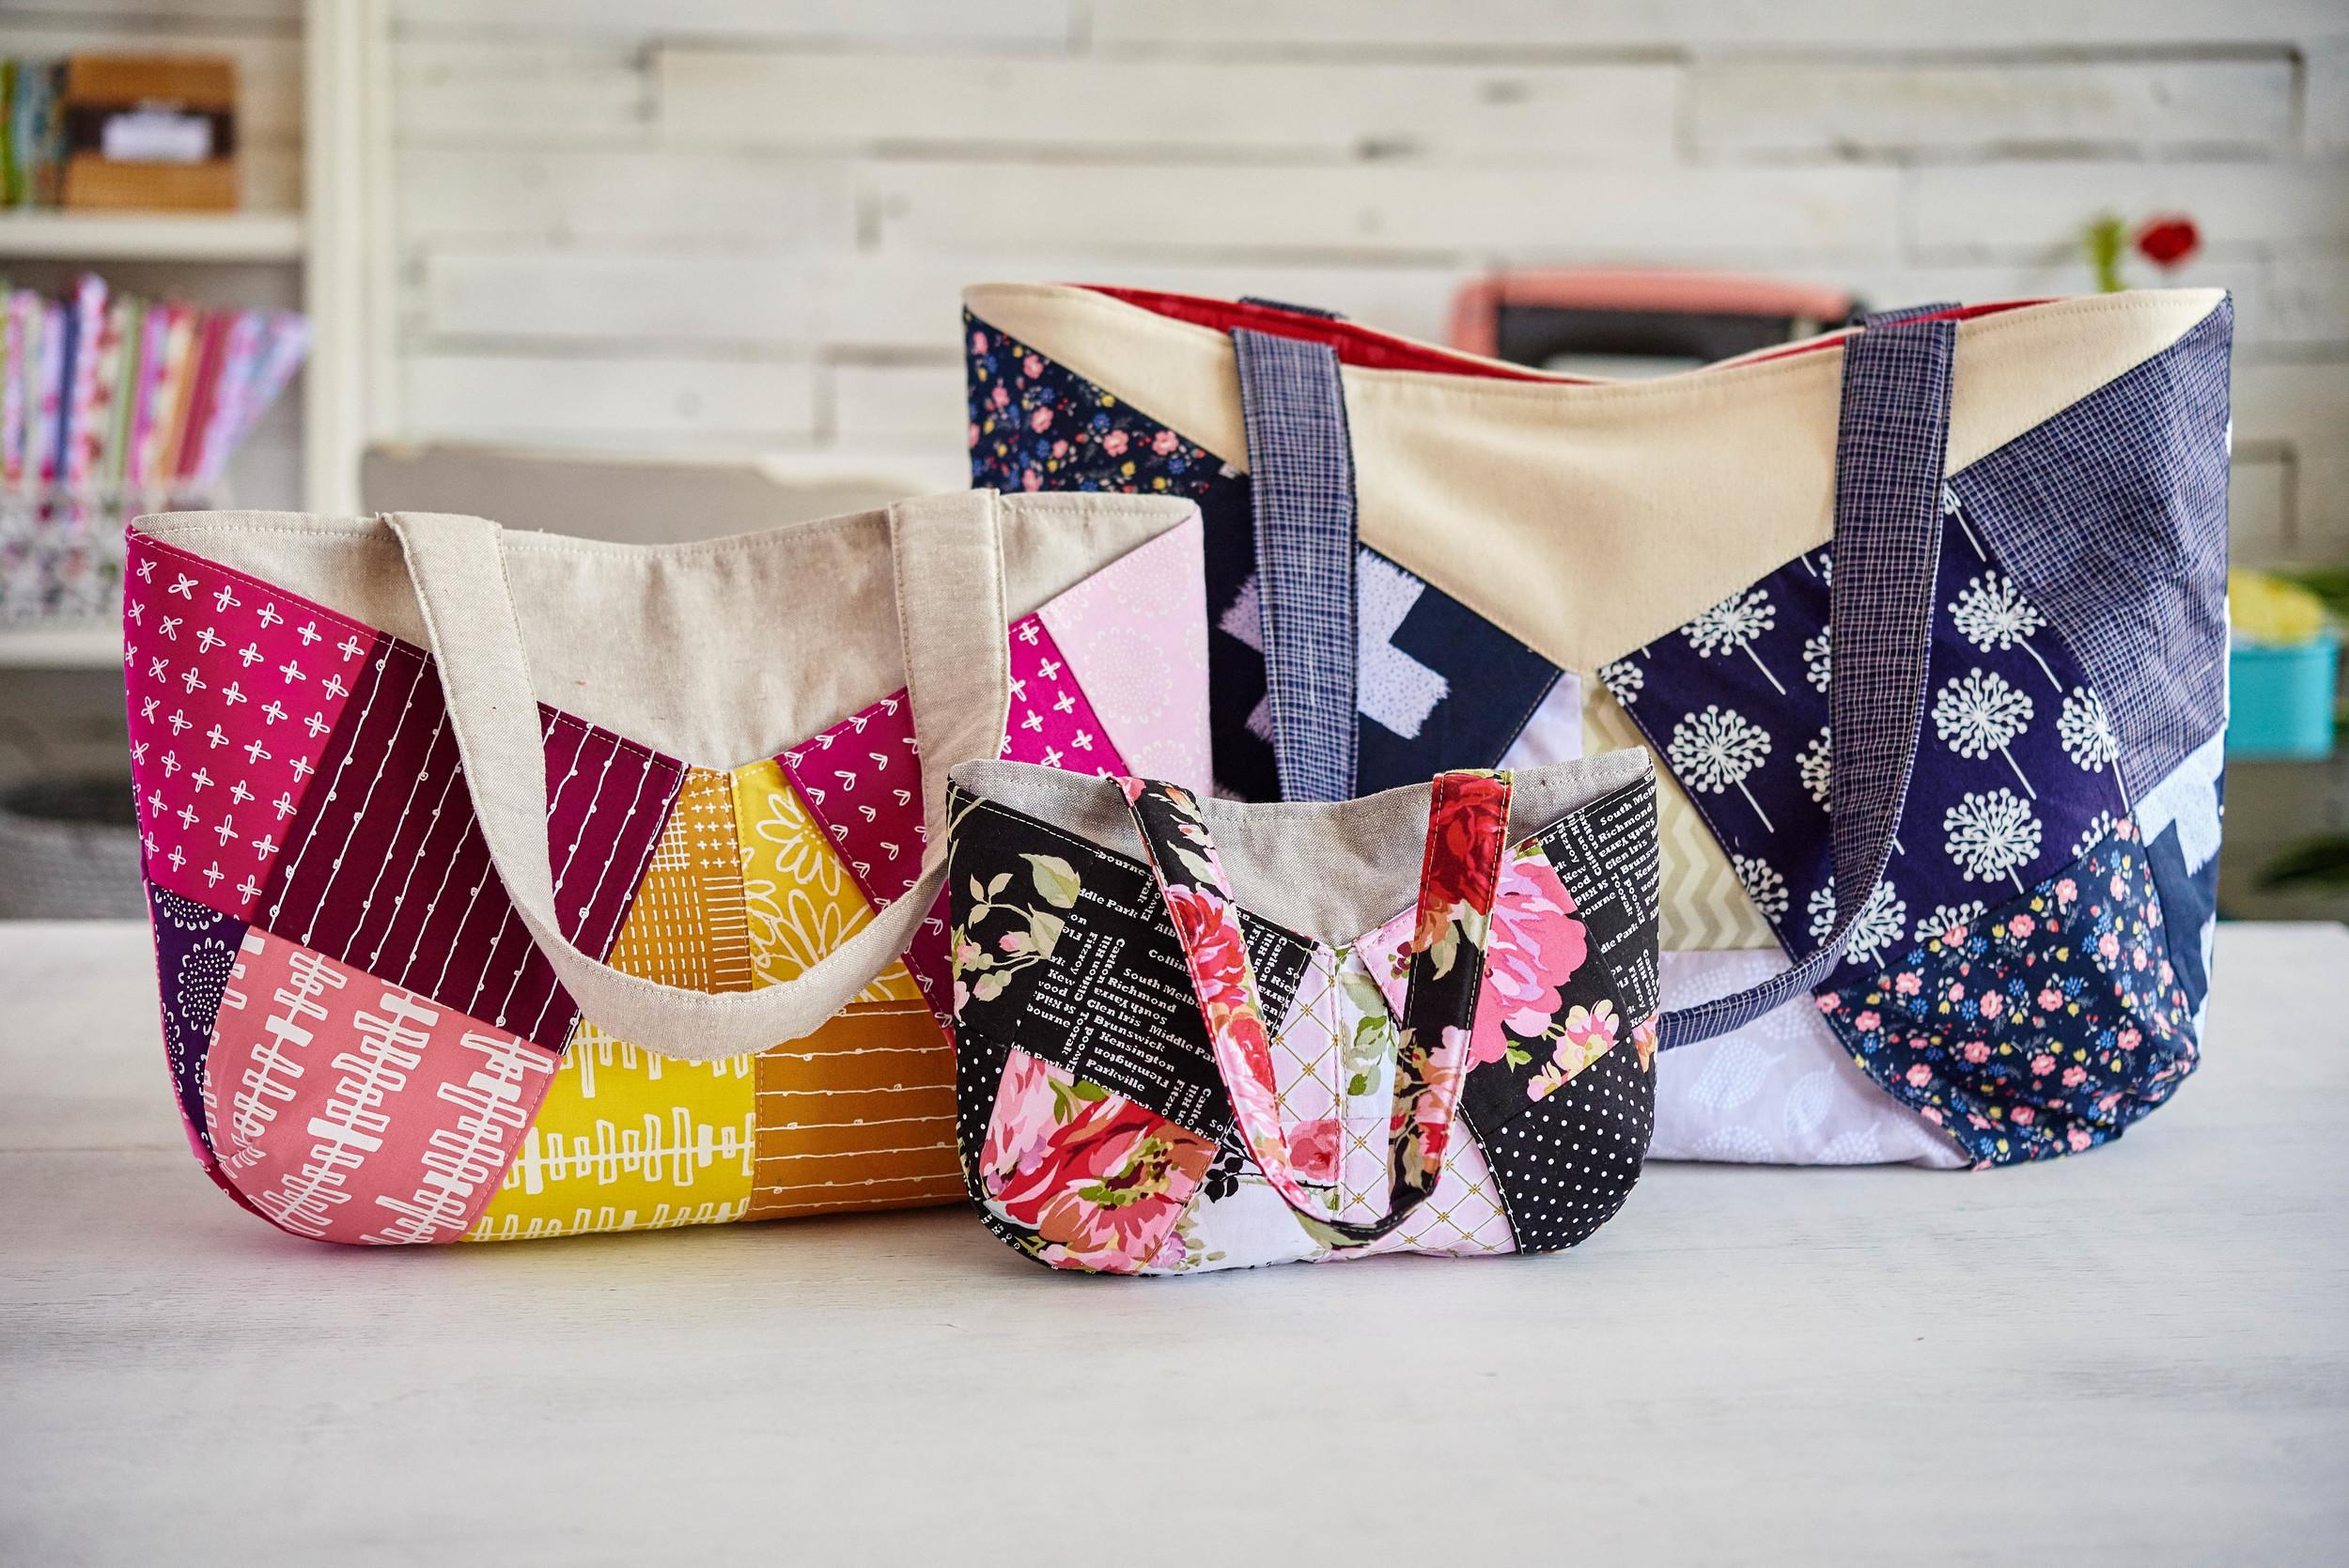 -10637_CB_Colorful Patchwork Baskets & Bags_Caroline Fairbanks-Critchfield13361_retouched.jpg